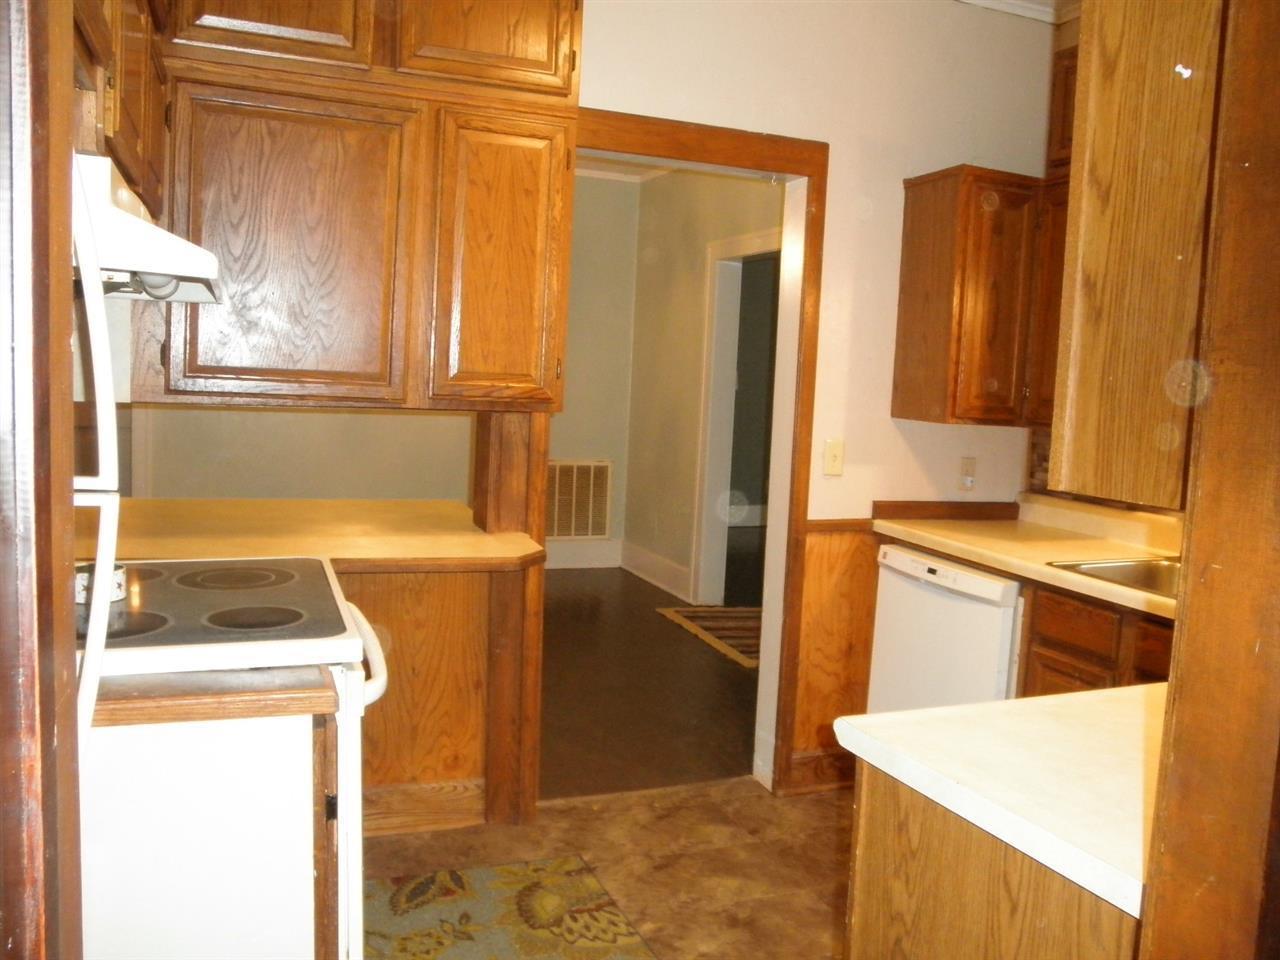 #century21groupone,#homesforsaleponcacity,#poncacityrealestate | 840 N Birch  Ponca City, OK 74601 10